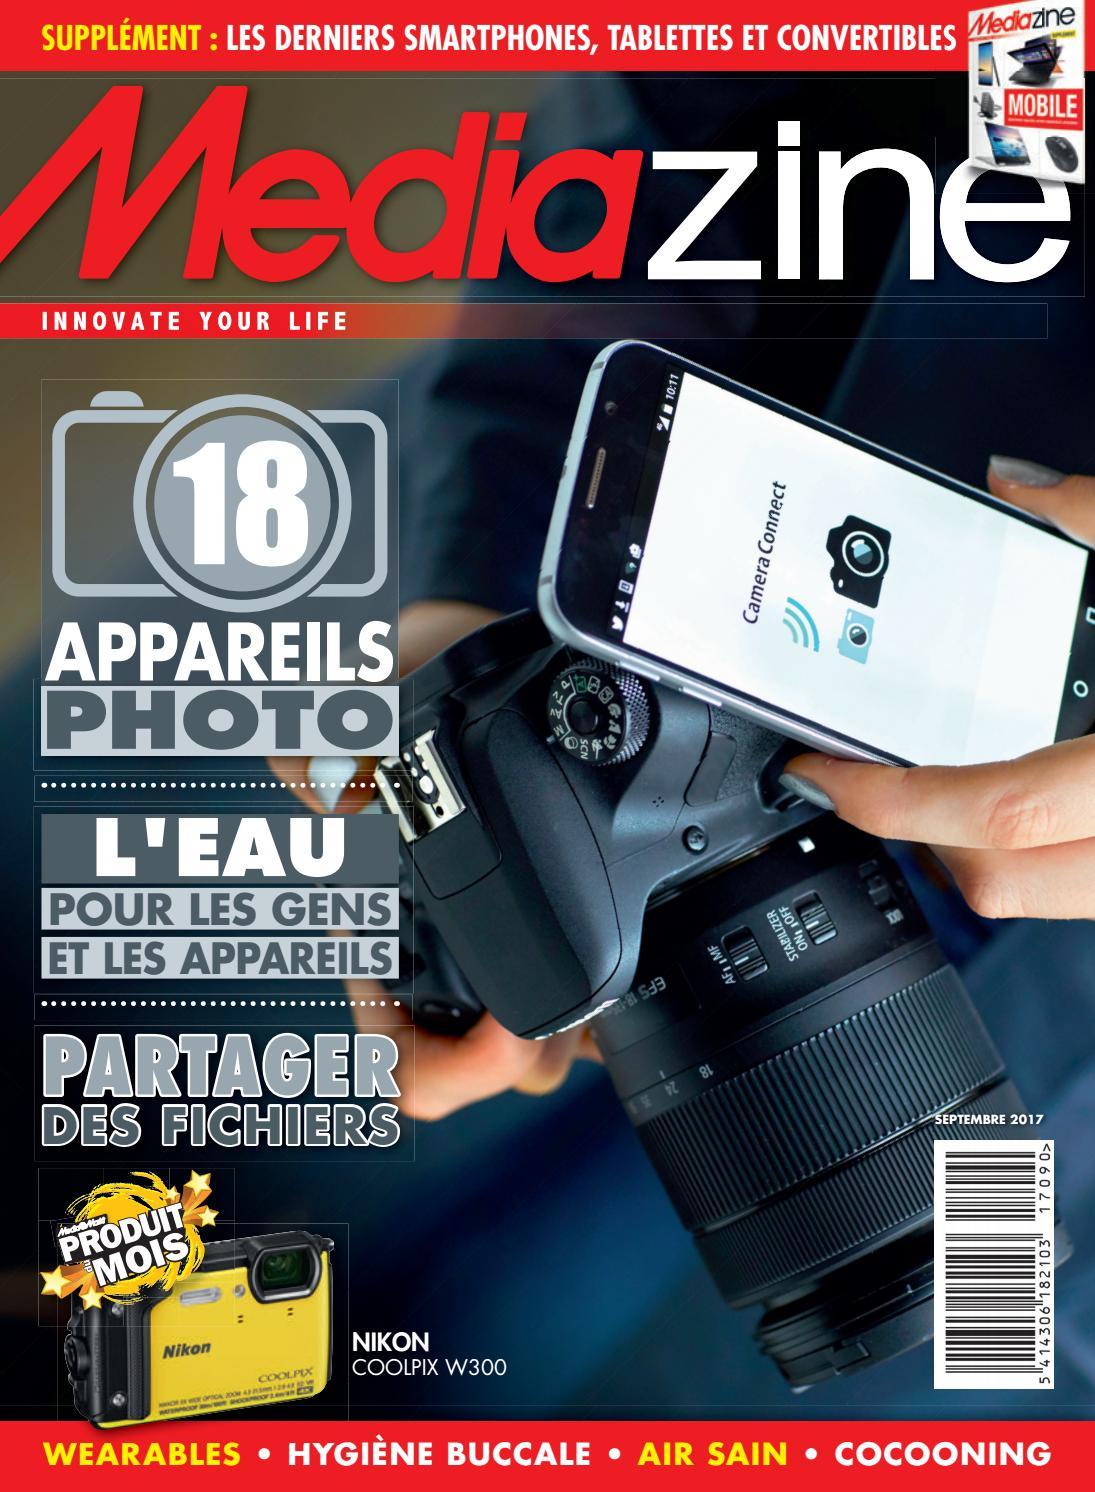 Mediazine Belgique Septembre 2017 by Mediazine België Belgique - issuu cc21bc4f7db7